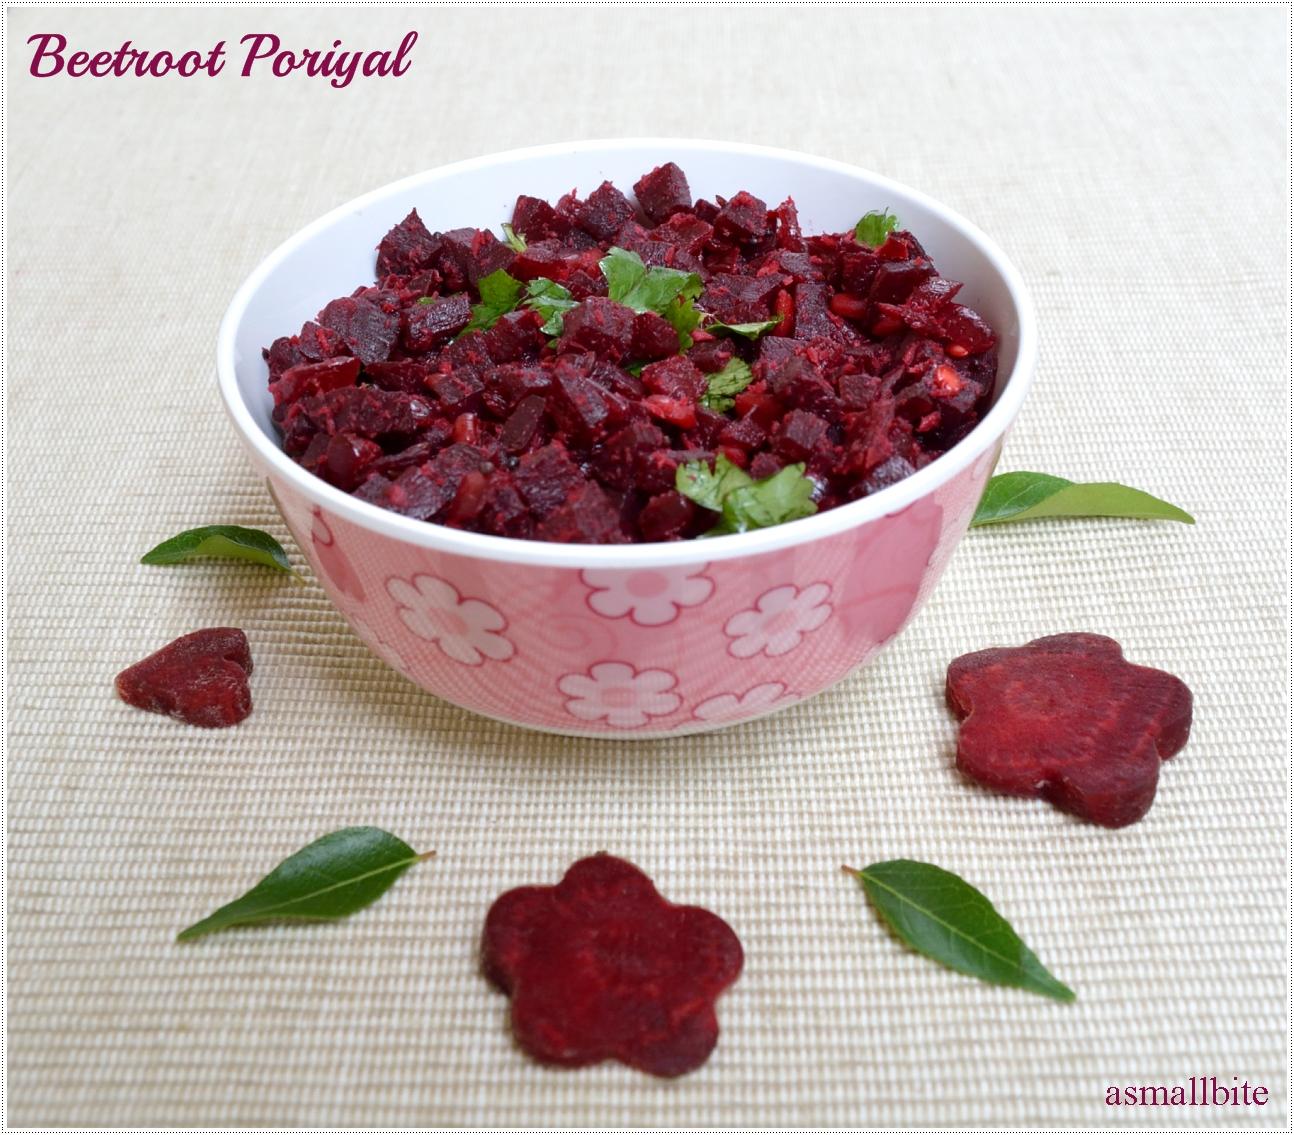 Beetroot Poriyal Recipe | Beetroot Recipes